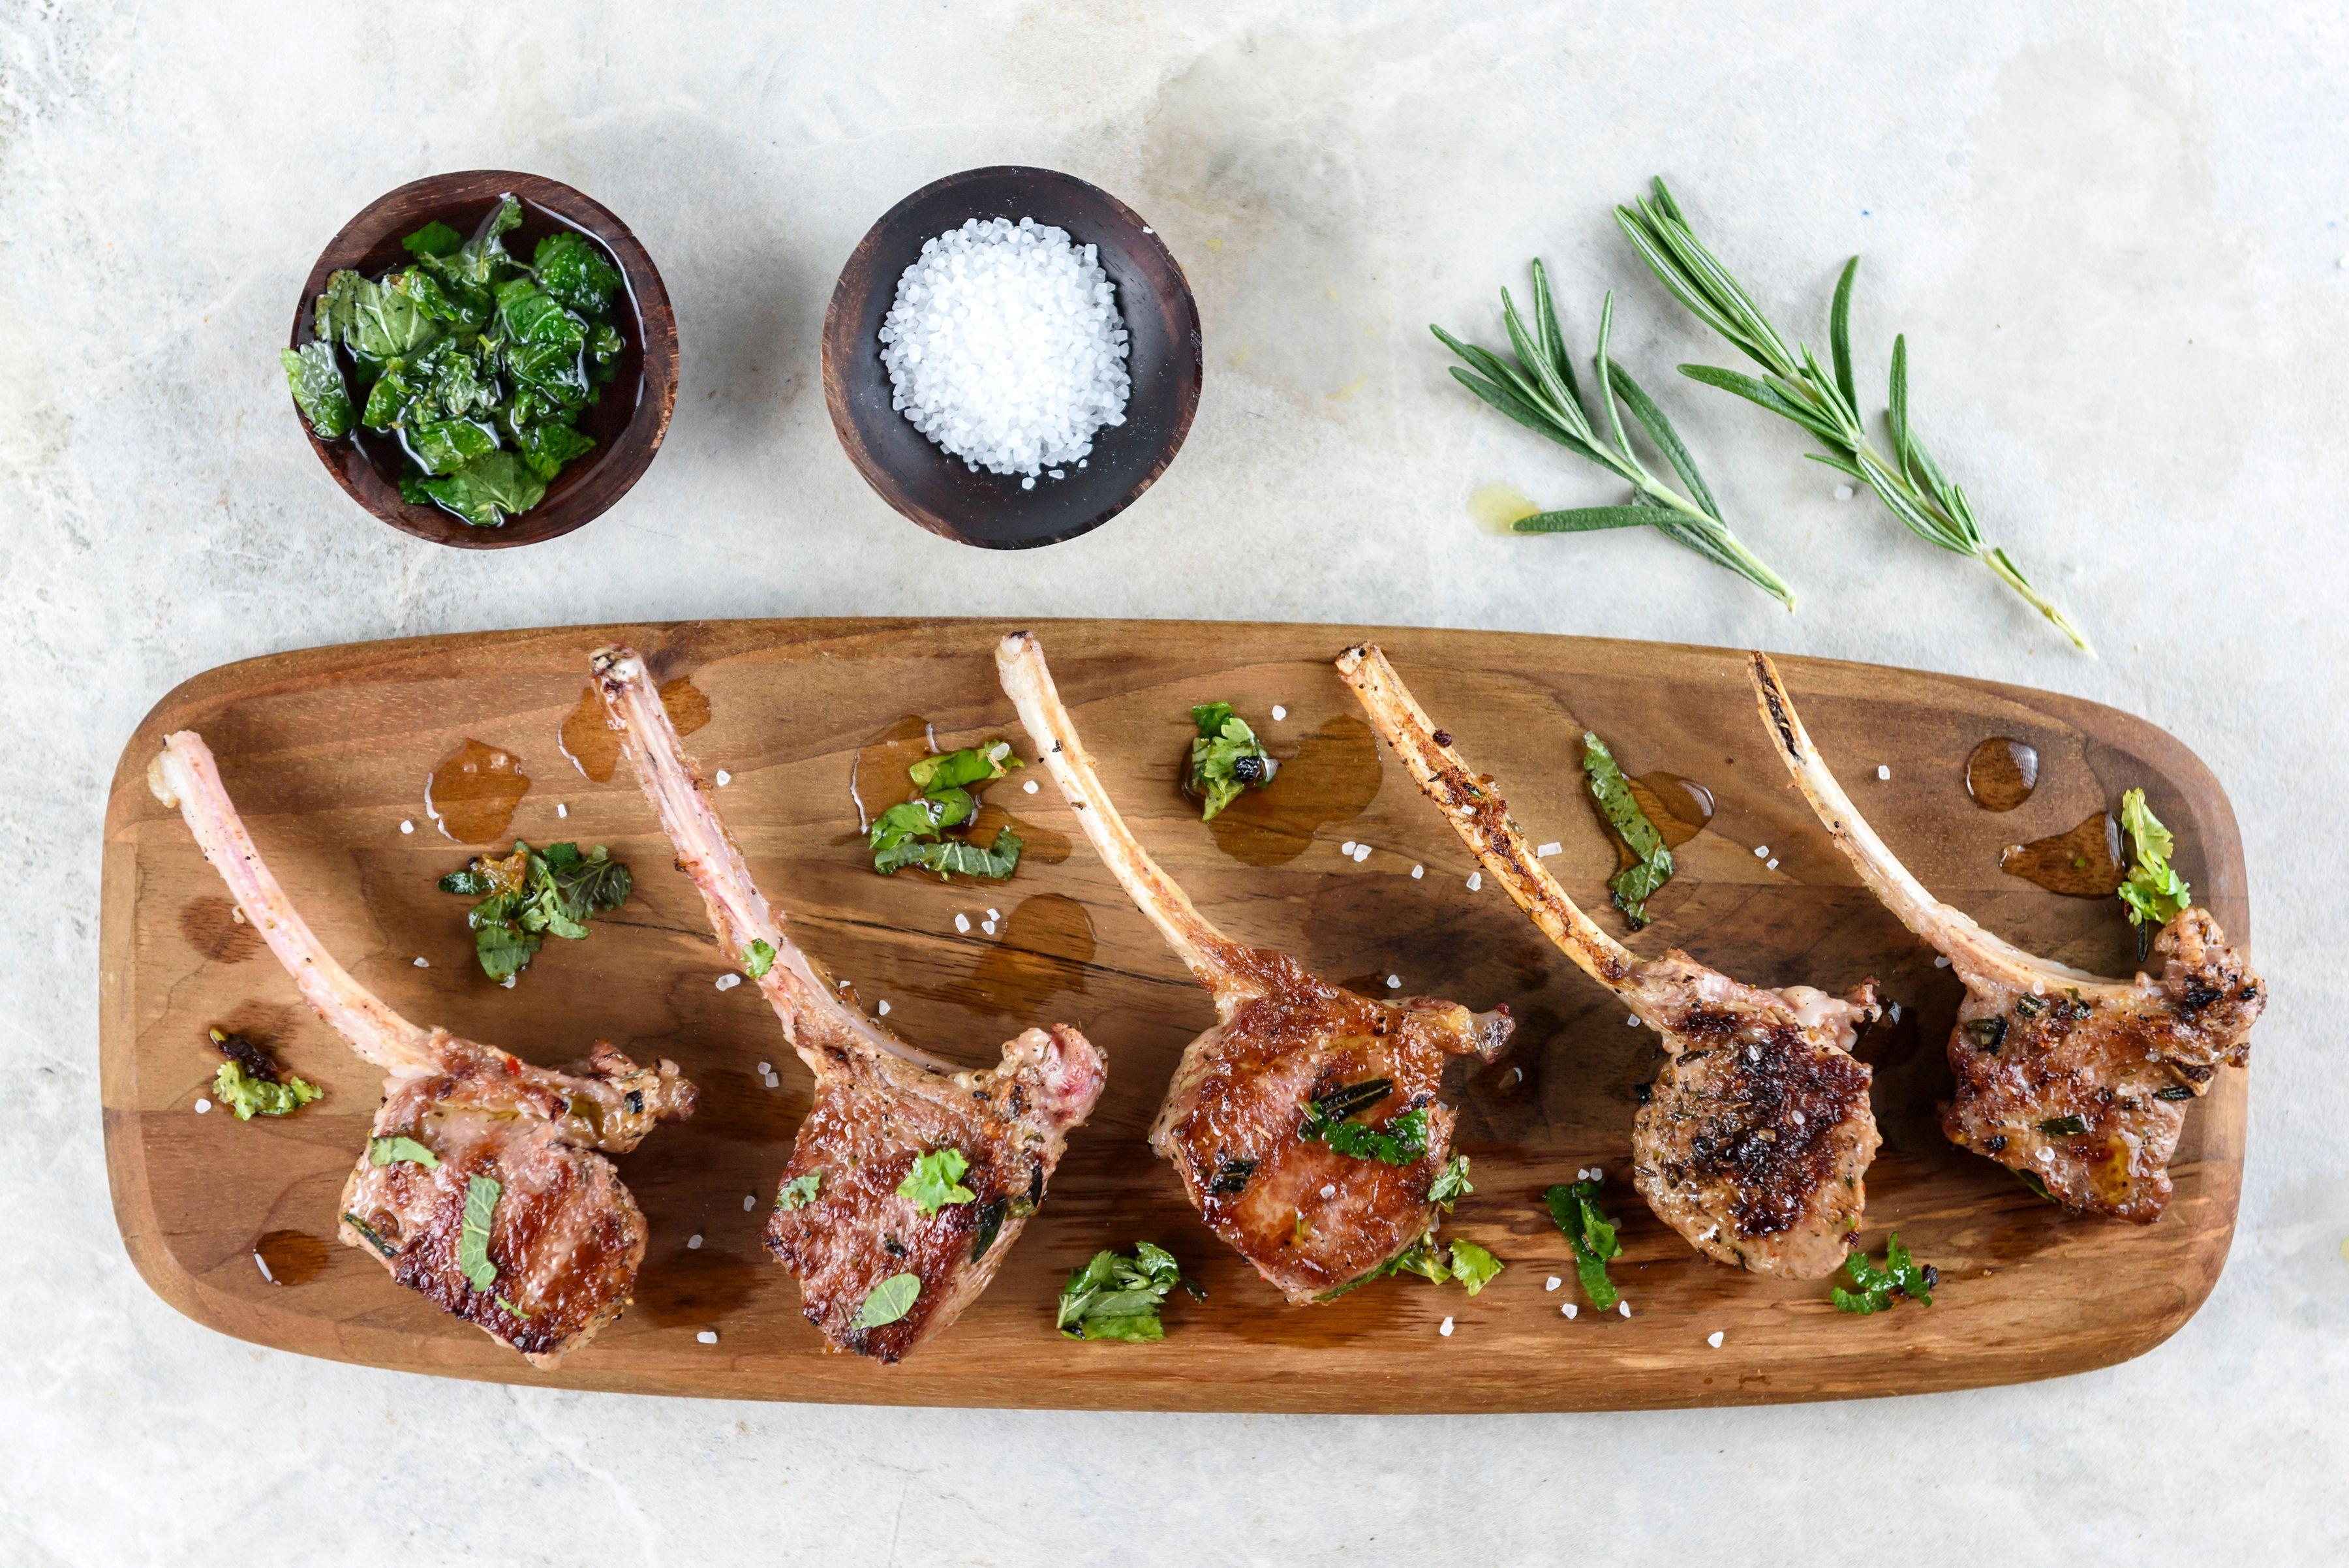 Fresh herbs with lamb chops